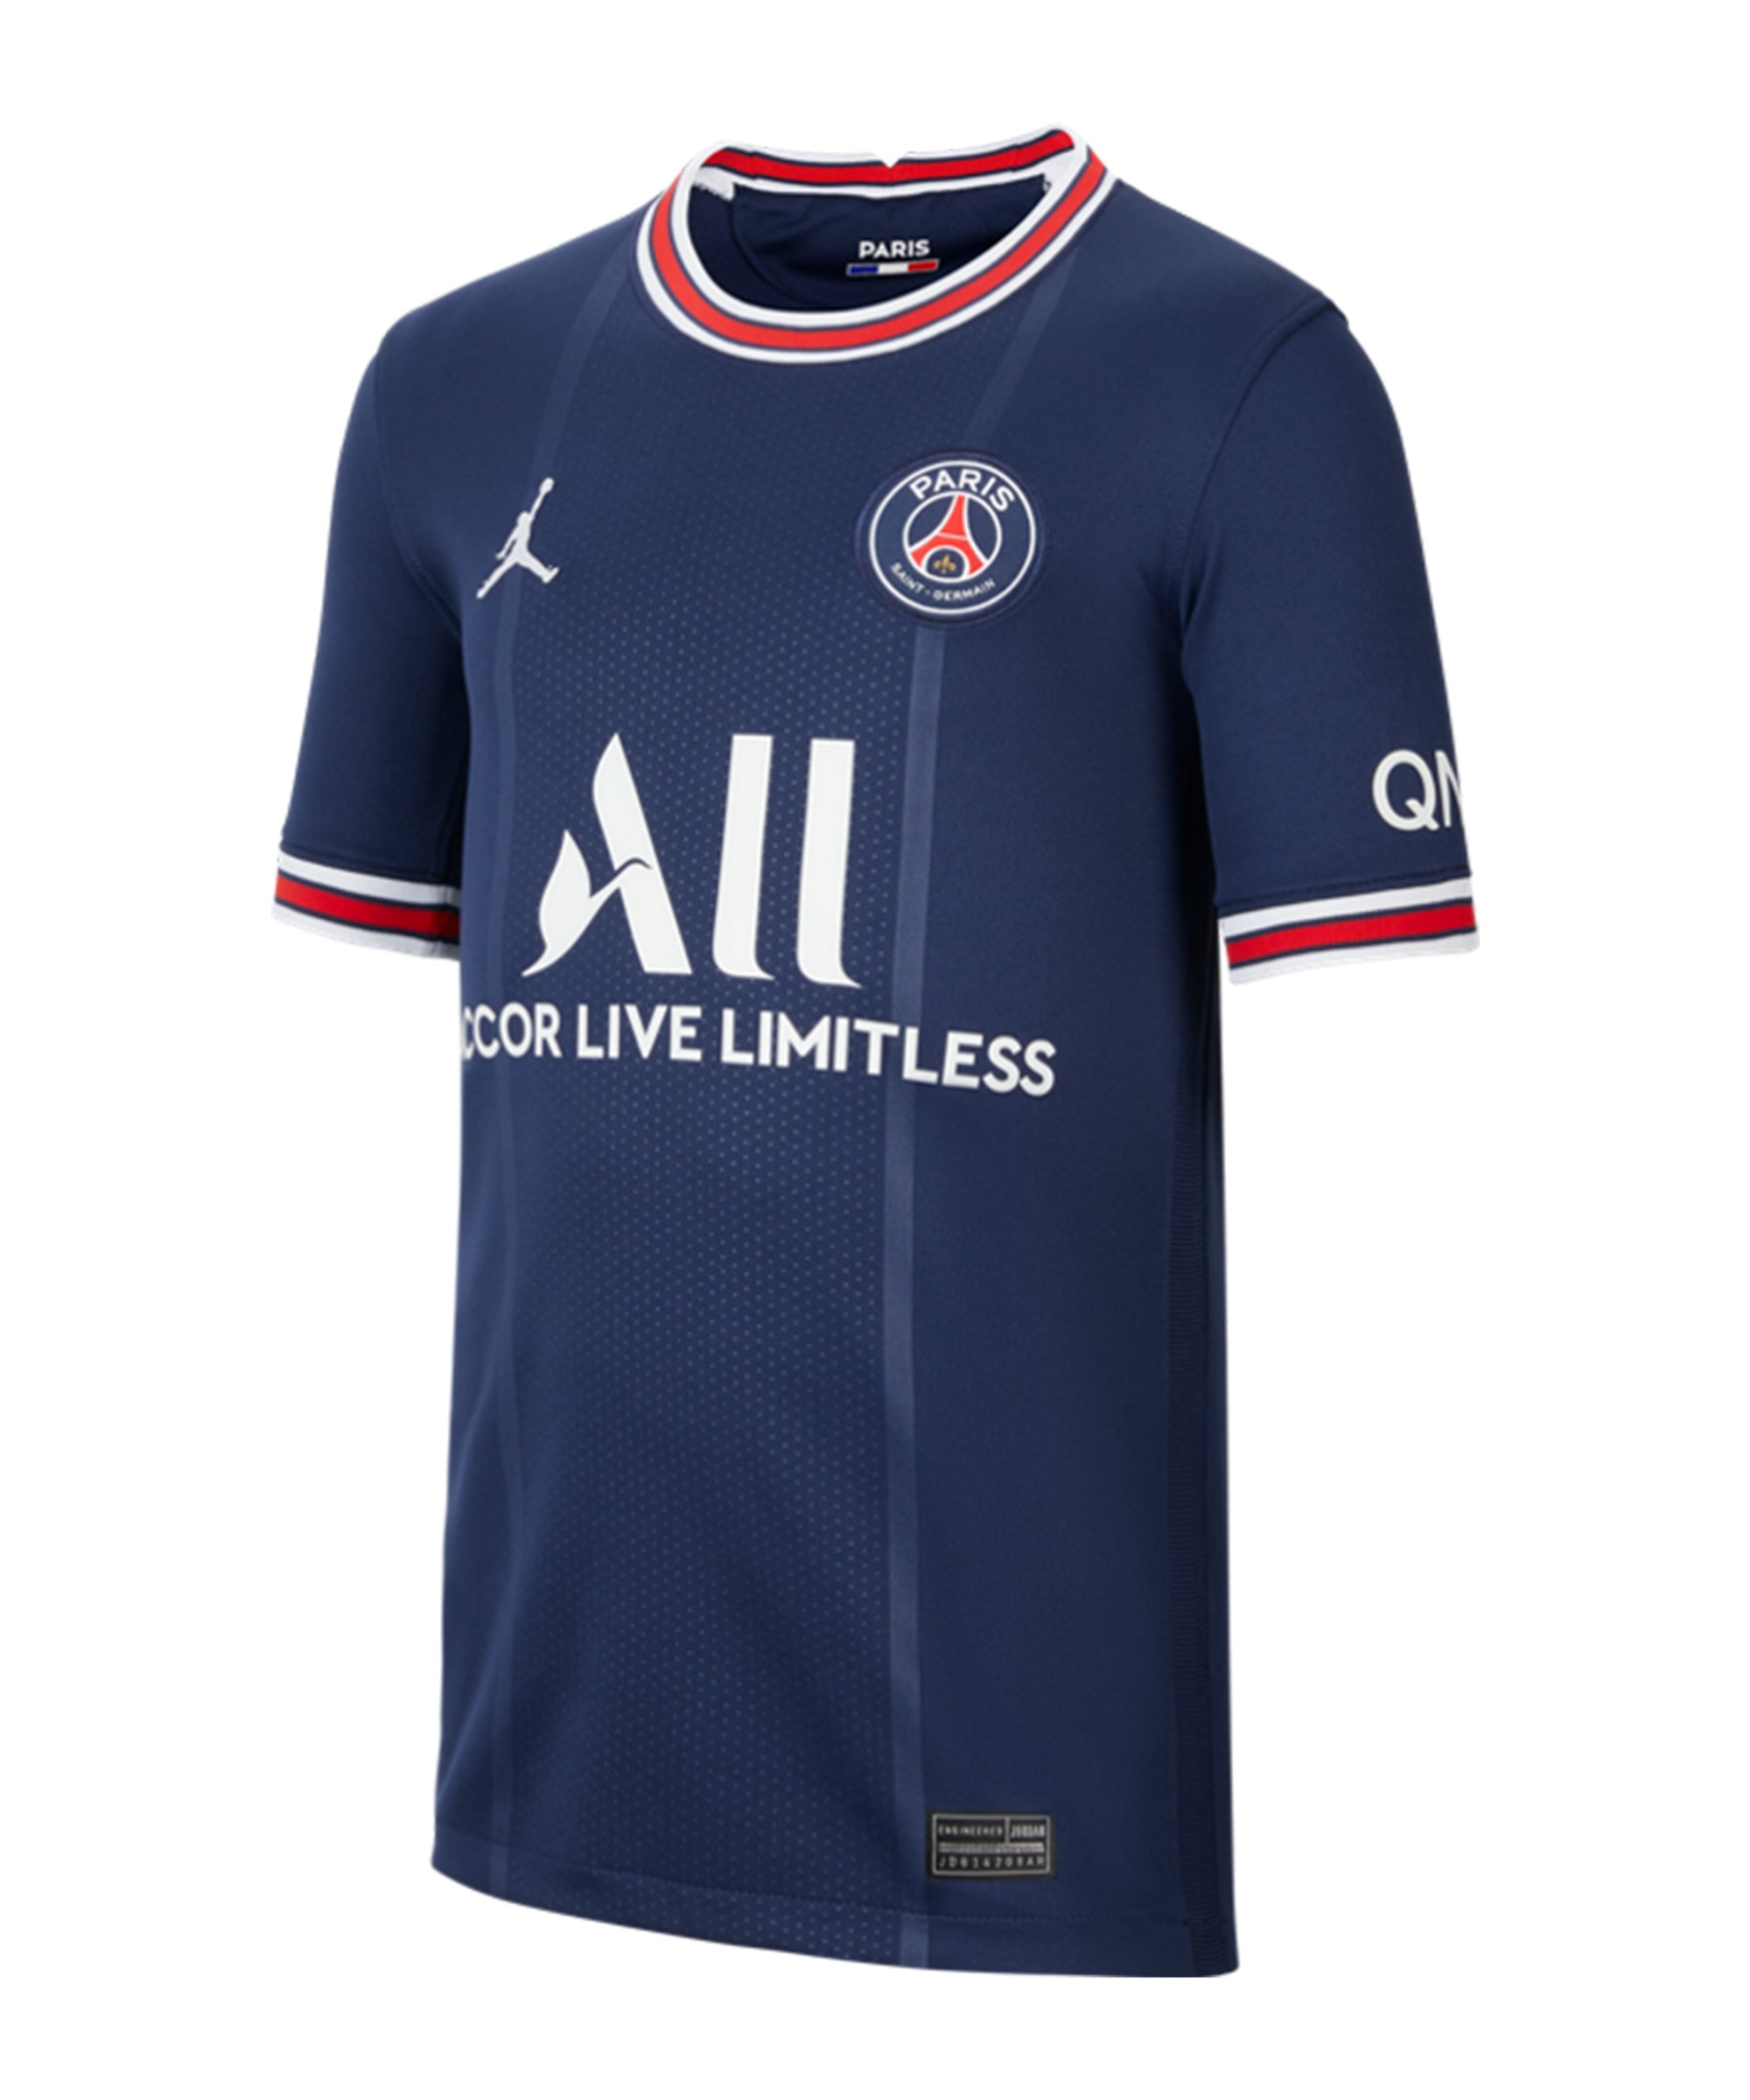 Jordan Paris St. Germain Triko Home 2021/2022 Kids Blau F411 - blau